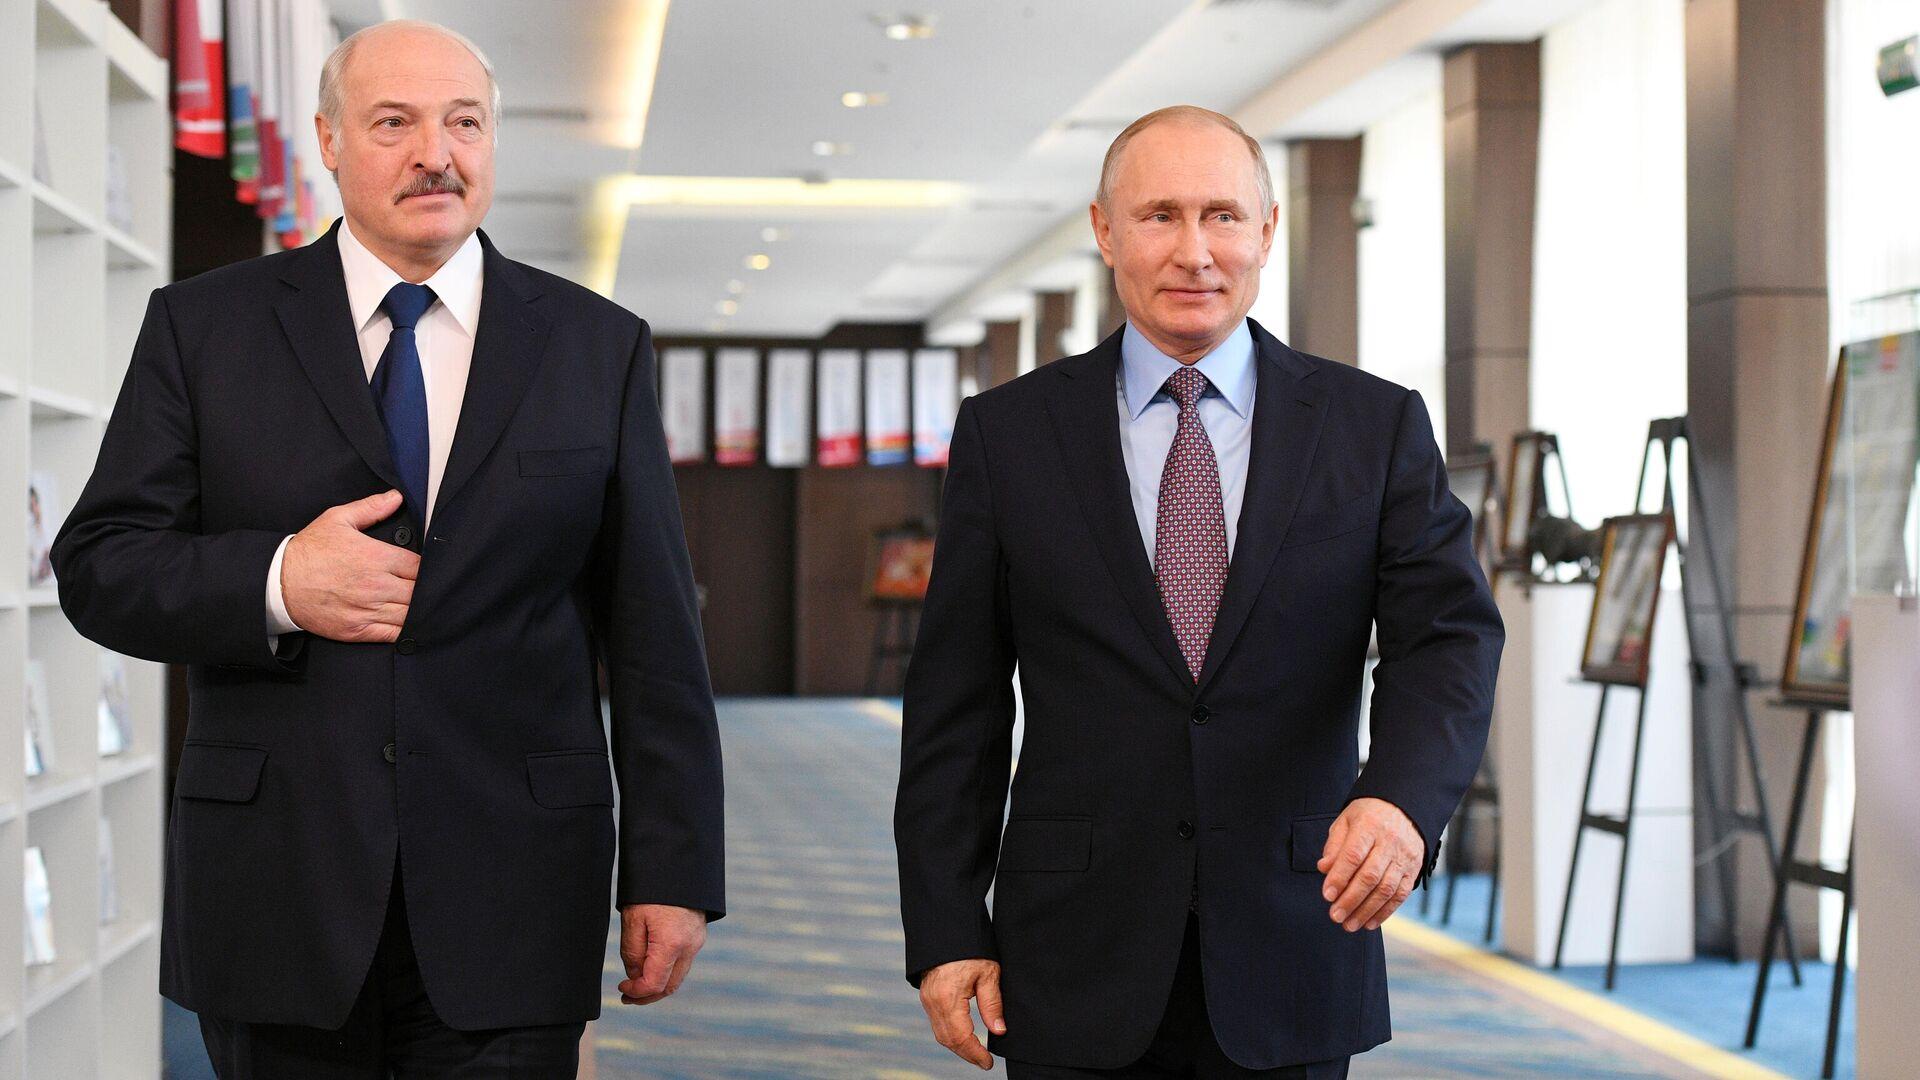 Президент РФ Владимир Путин и президент Белоруссии Александр Лукашенко - РИА Новости, 1920, 28.05.2021